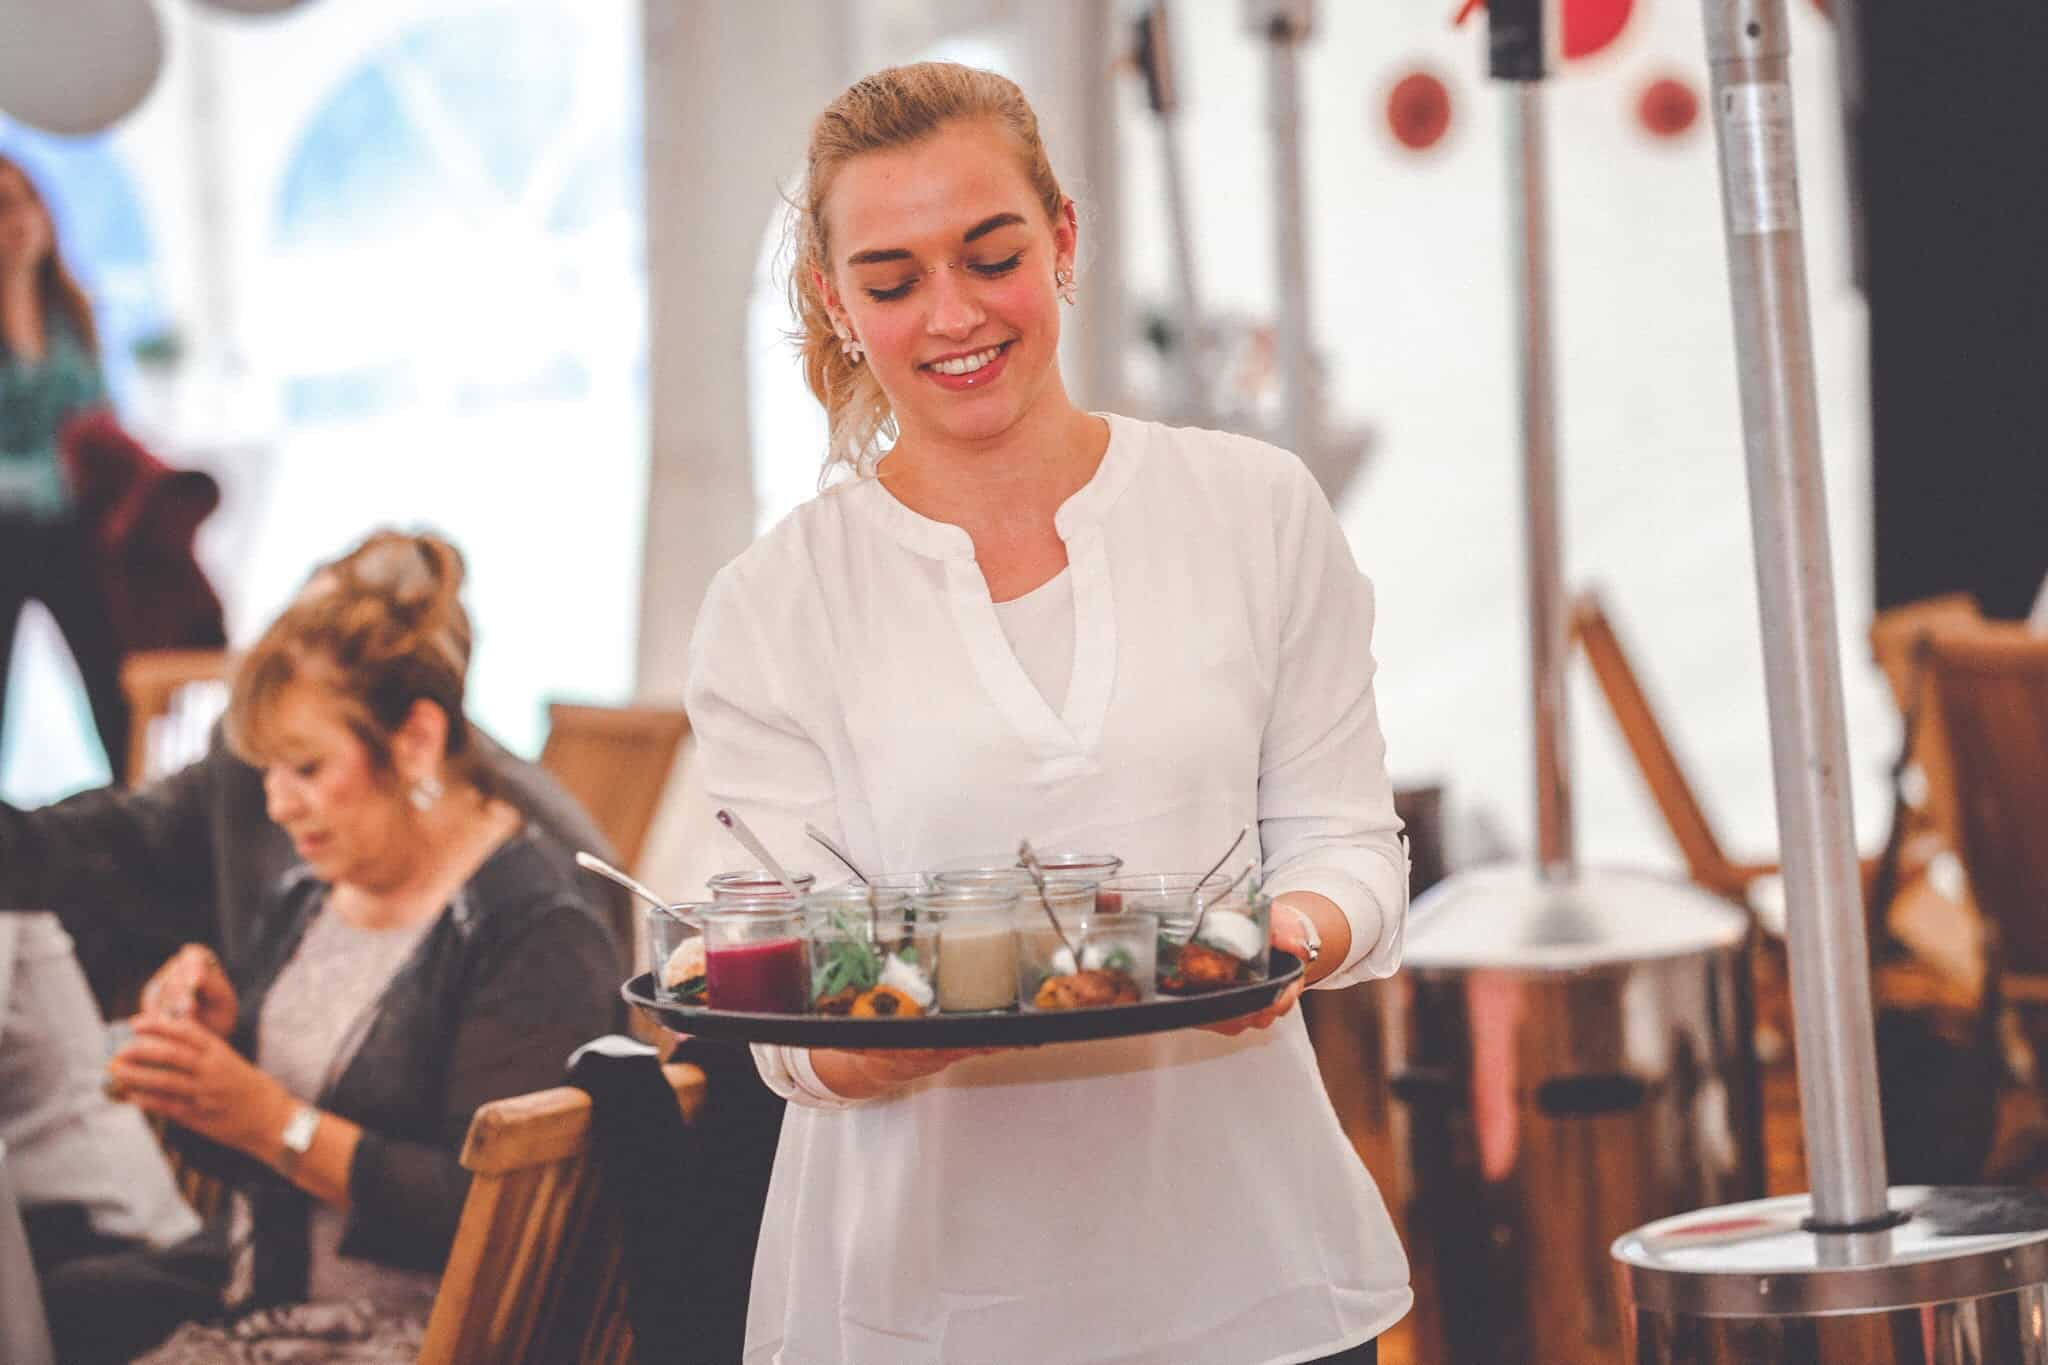 Bosseln und Kallen Catering Essen Foodtruck (5)